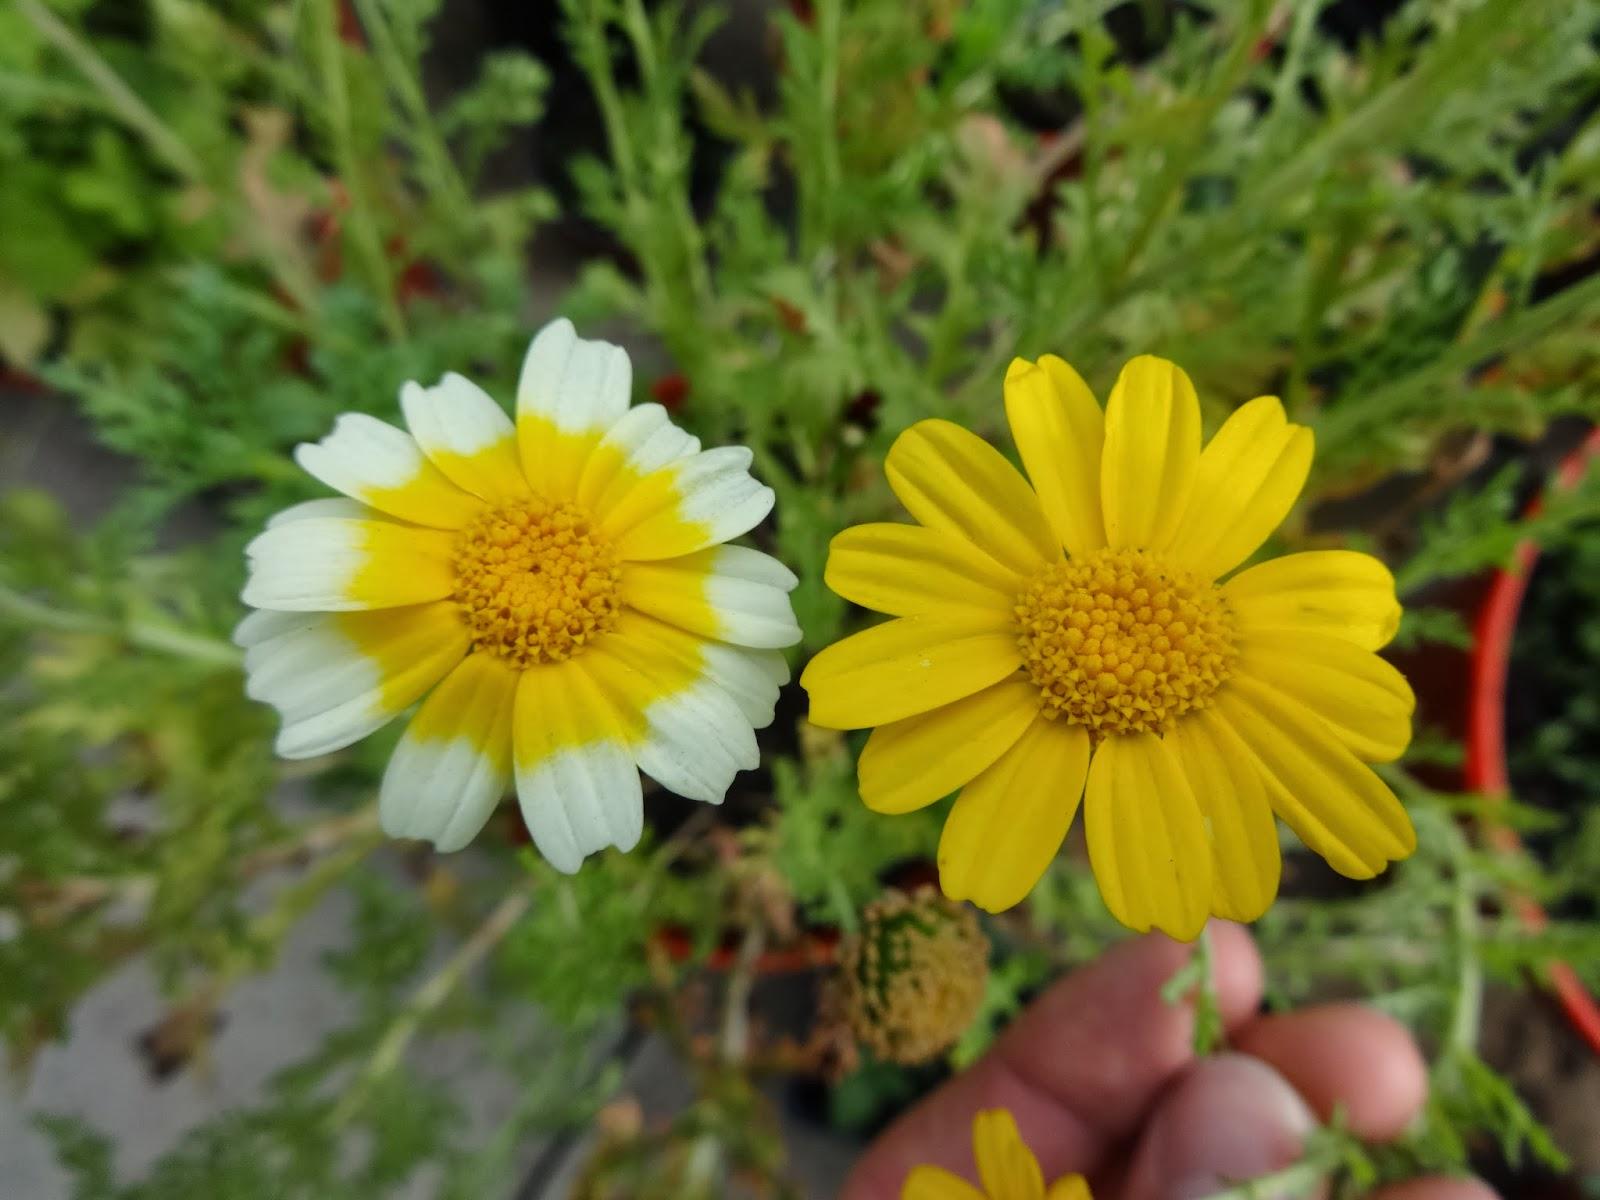 Herbs from distant lands chrysanthemum coronarium chop suey chrysanthemum coronarium chop suey greens crown daisy izmirmasajfo